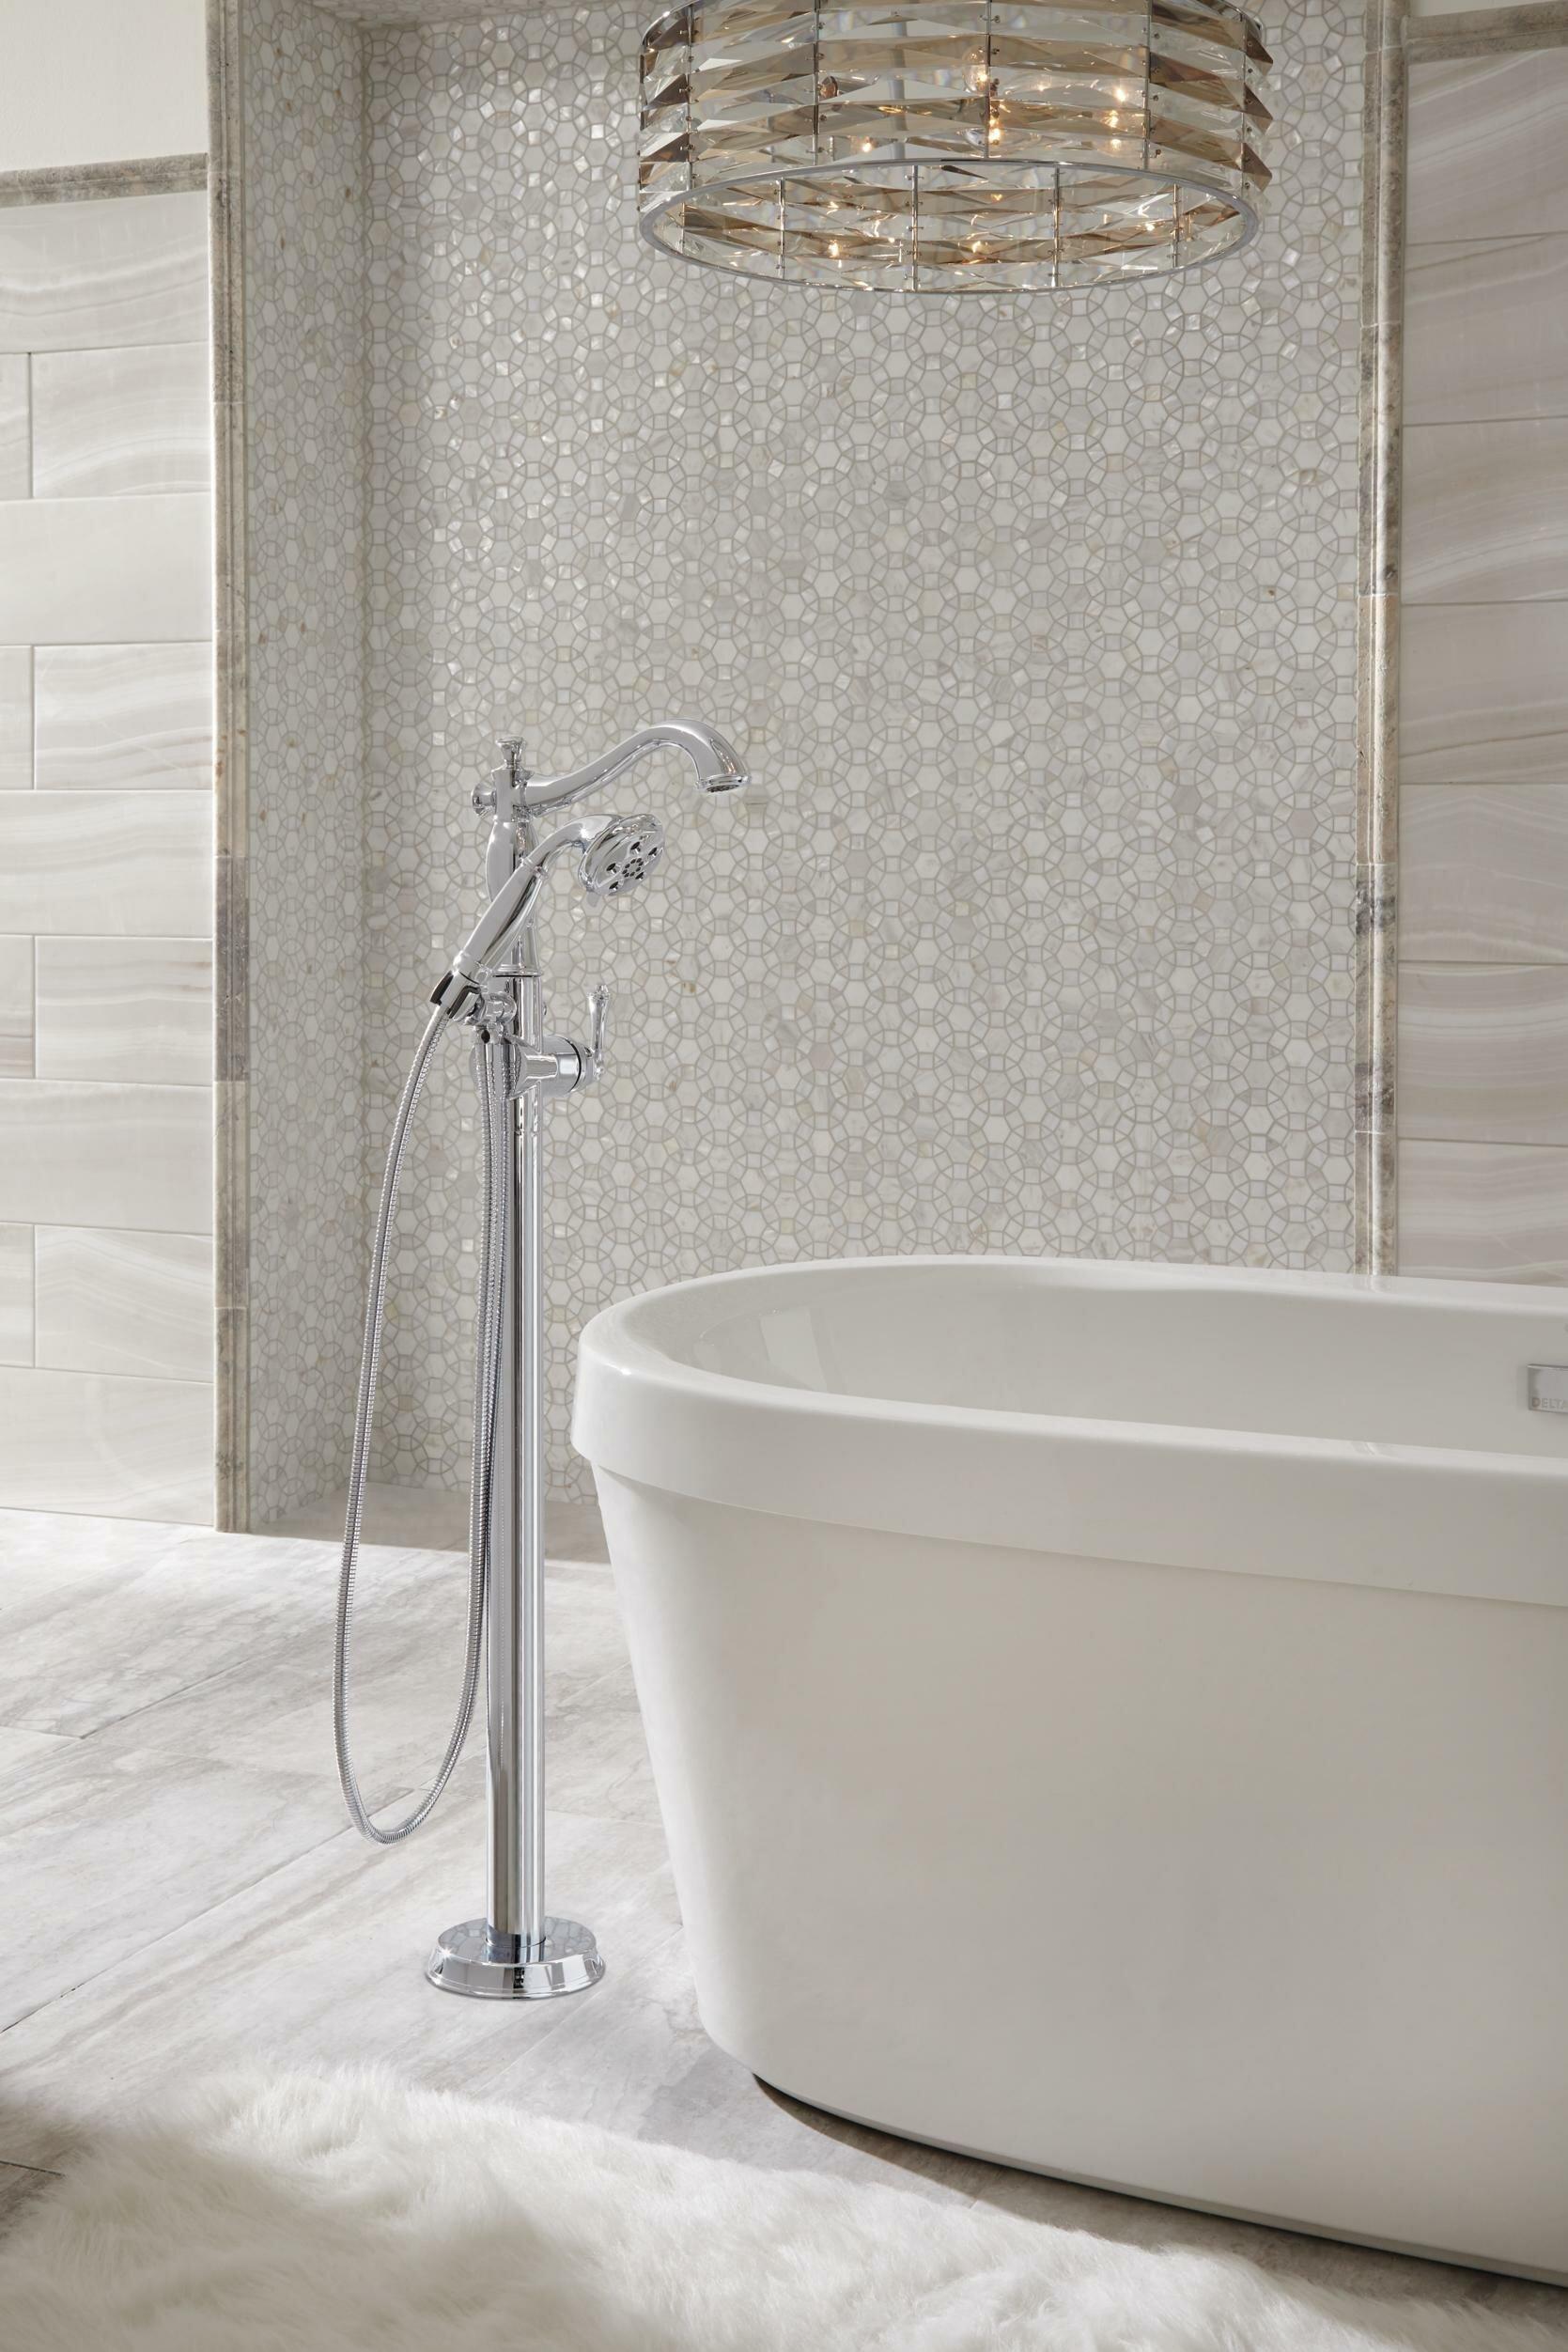 floors head spout psdc chrome filler contemporary single with shower handheld dp ref floor handle polished bath akdy faucet mount freestanding tub